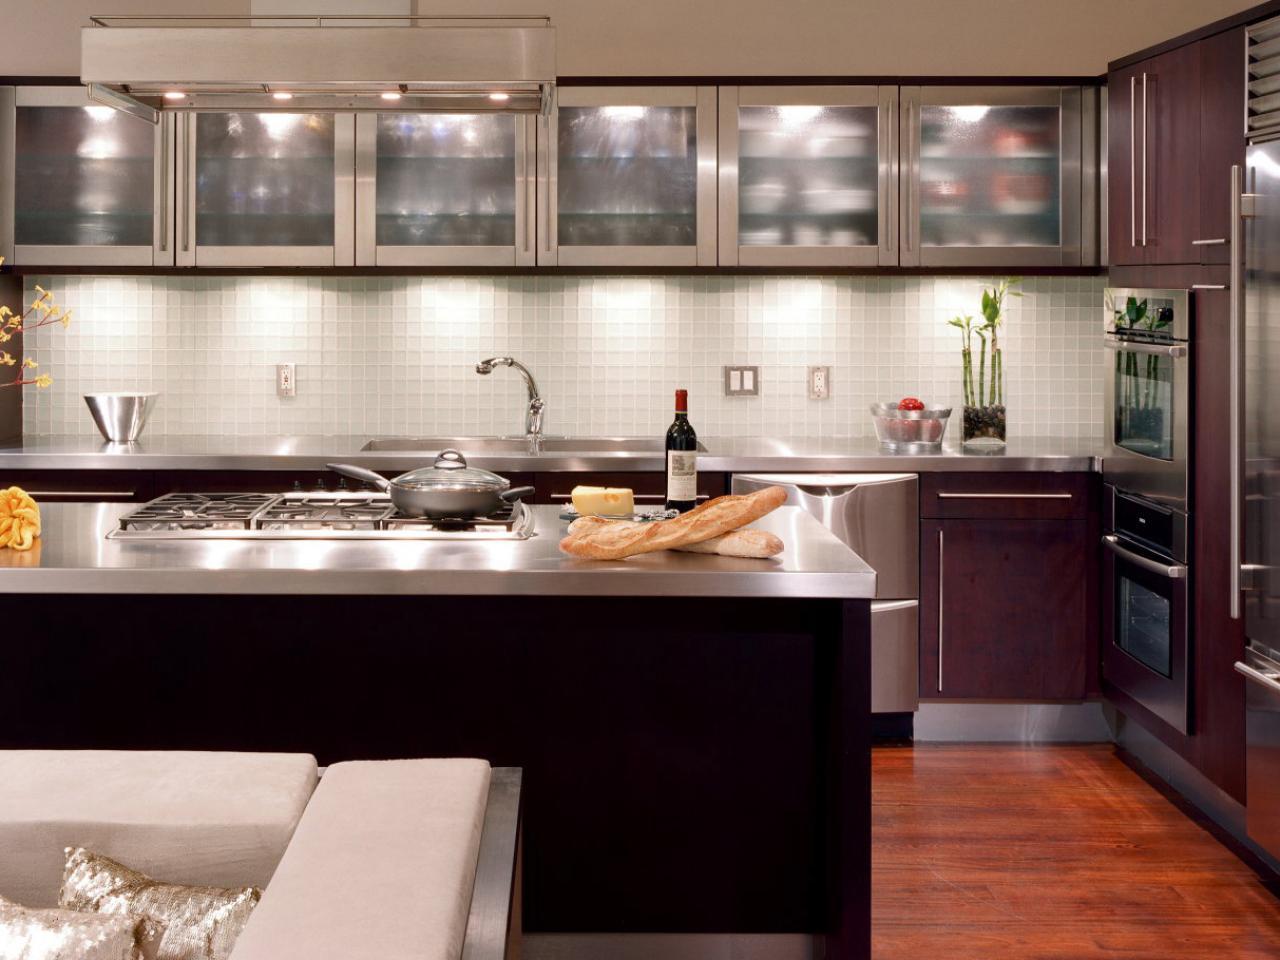 Thomasville Cabinets | Thomasville Cabinets Reviews | Thomasville Bathroom Cabinets